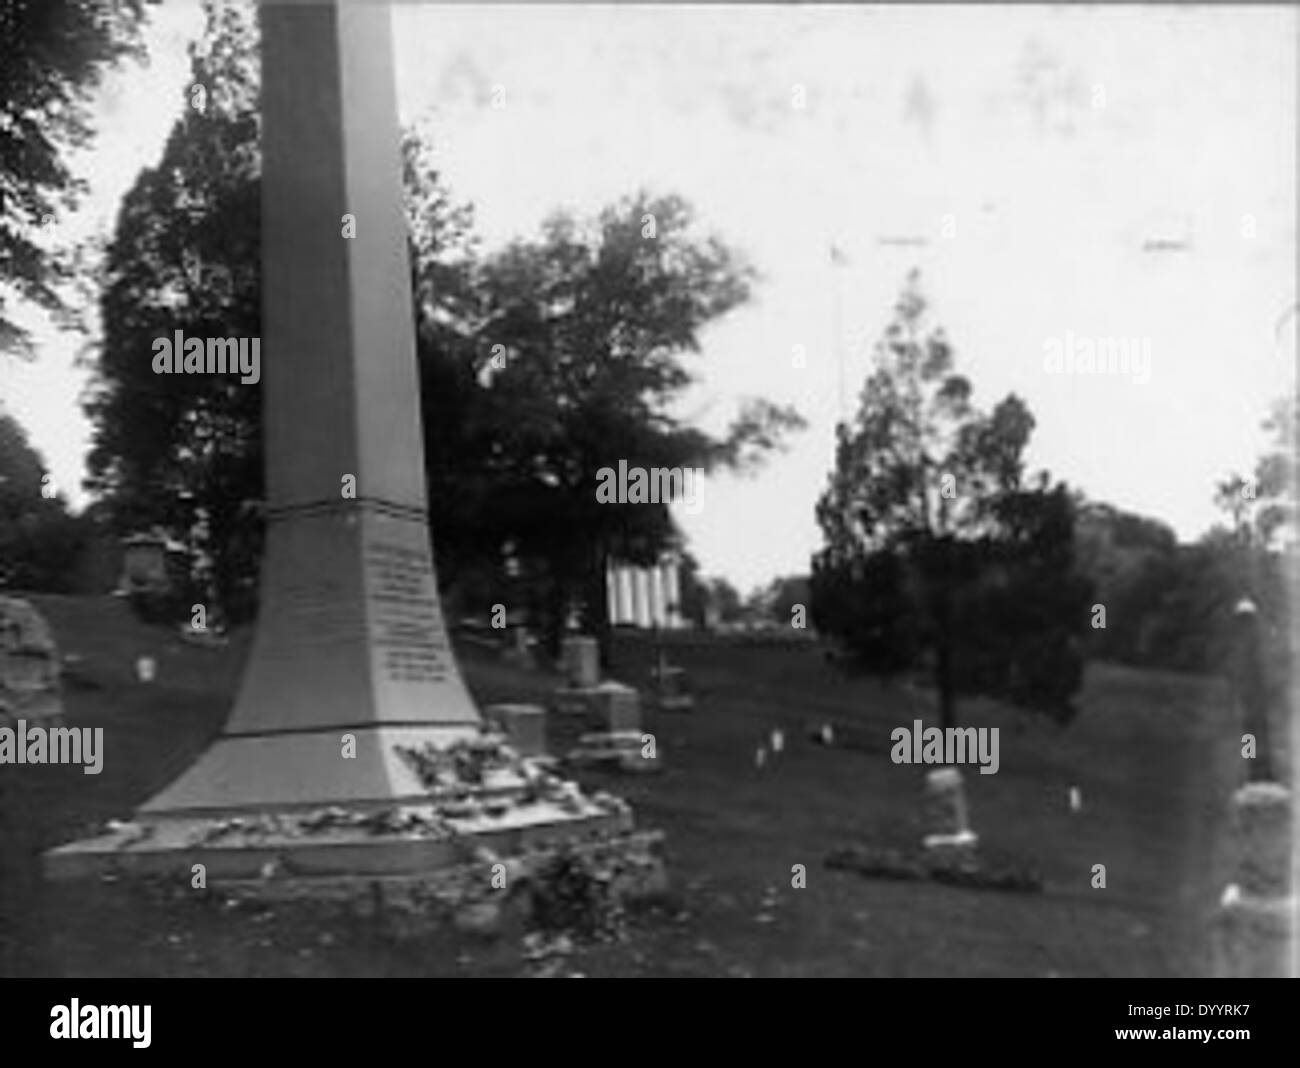 View of gravesites near Arlington House - Stock Image